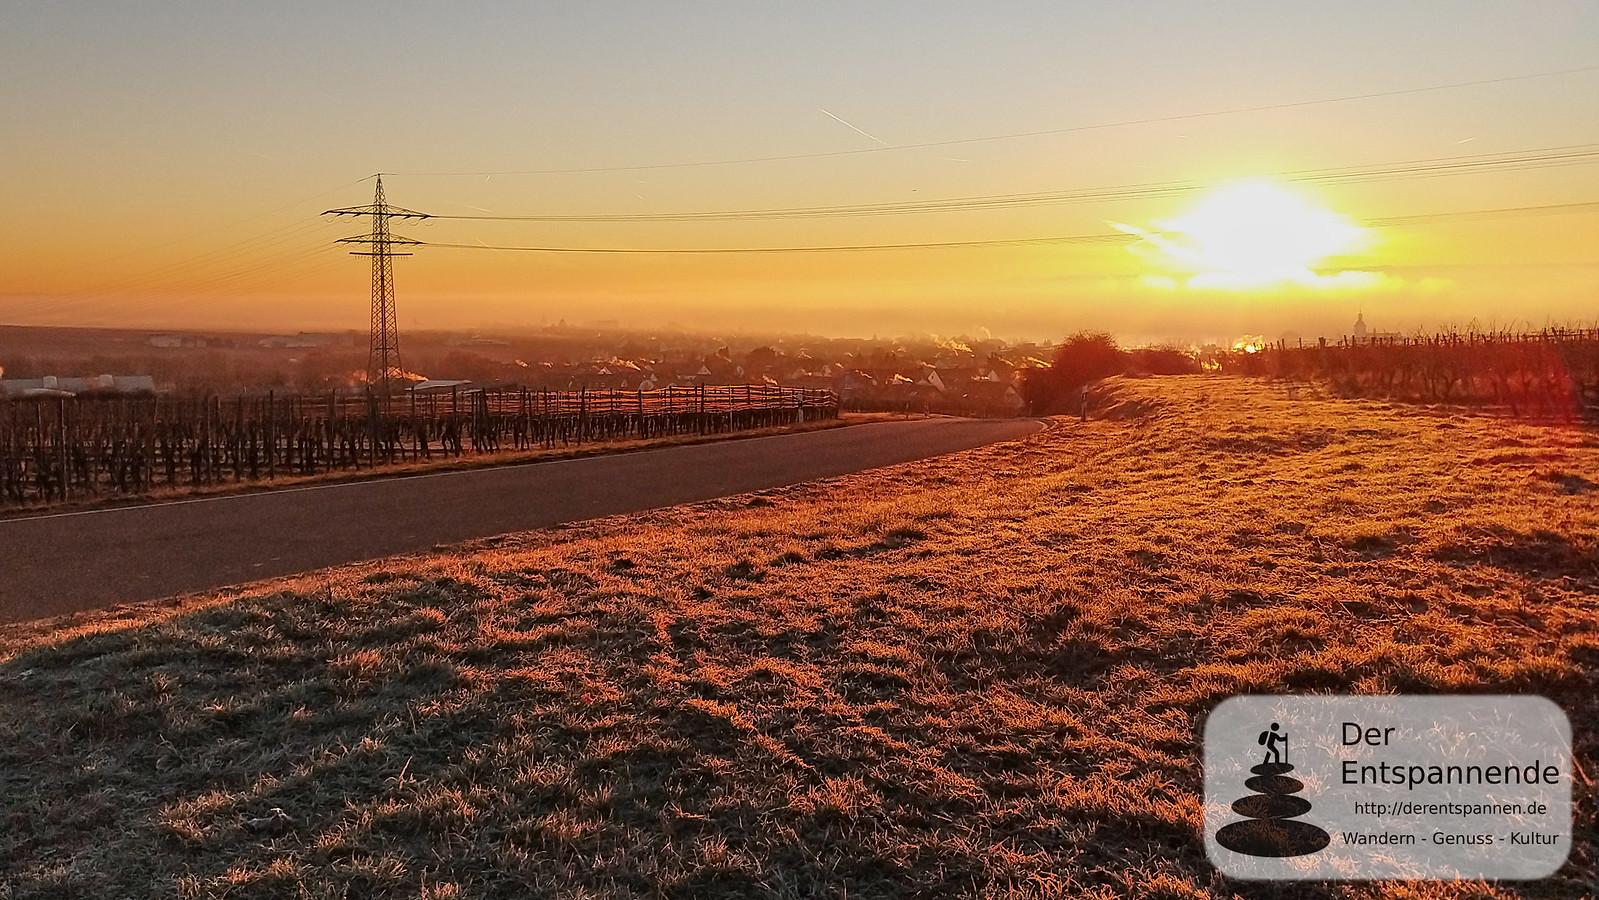 Sonnenaufgang über Oestrich-Winkel